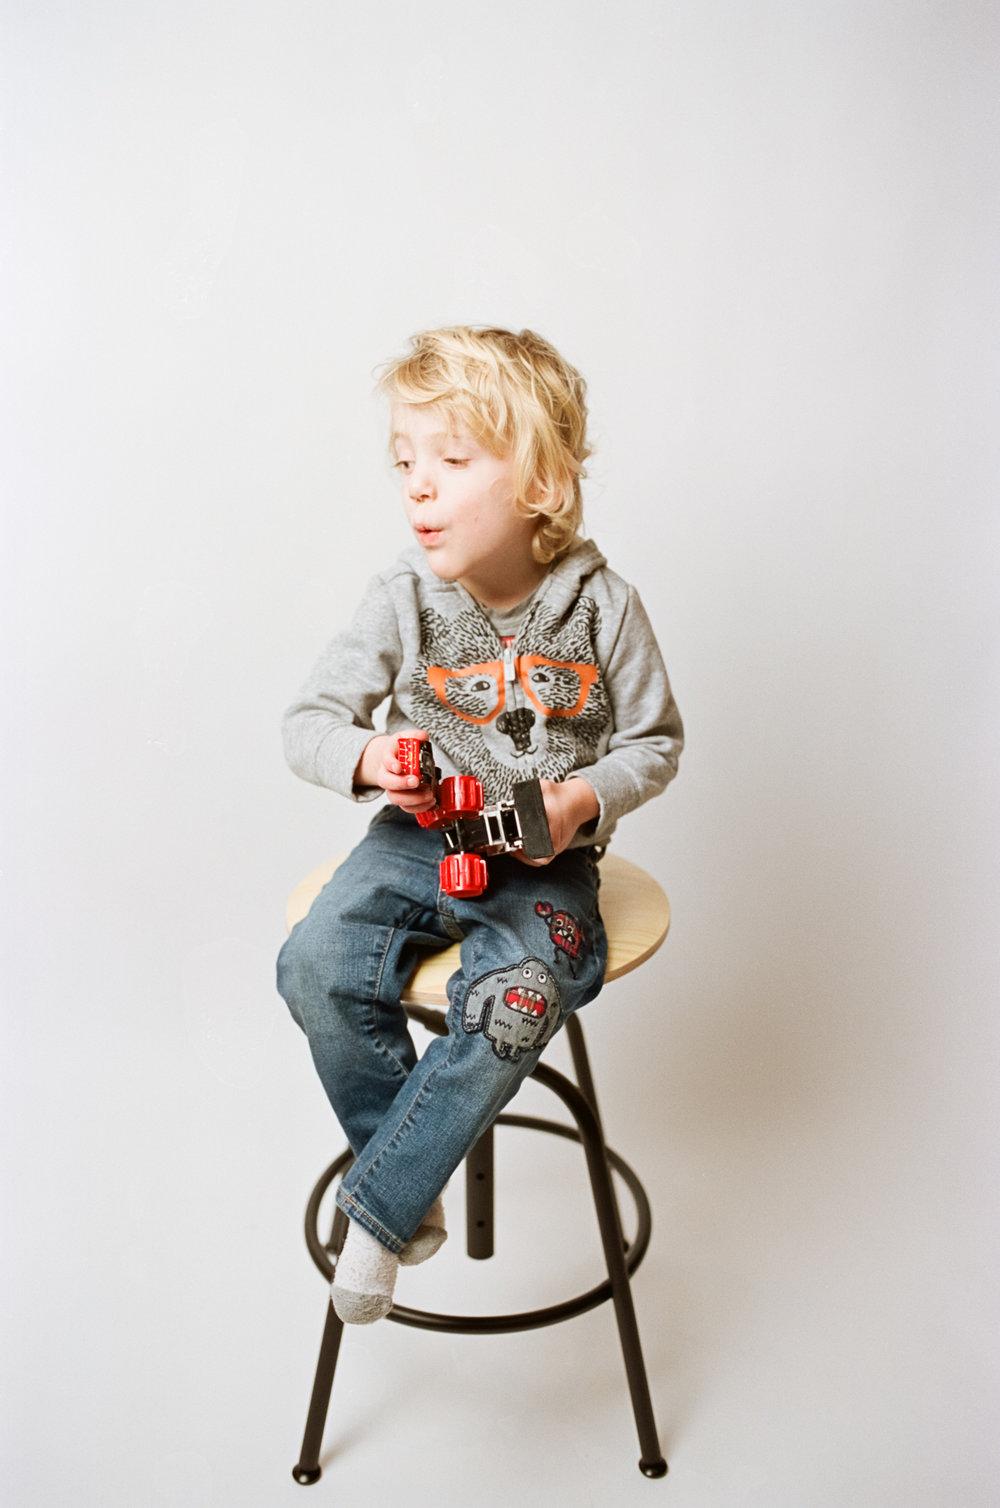 Minnetonka-Lifestyle-Photographer-Families-Seniors-Newborns.jpg